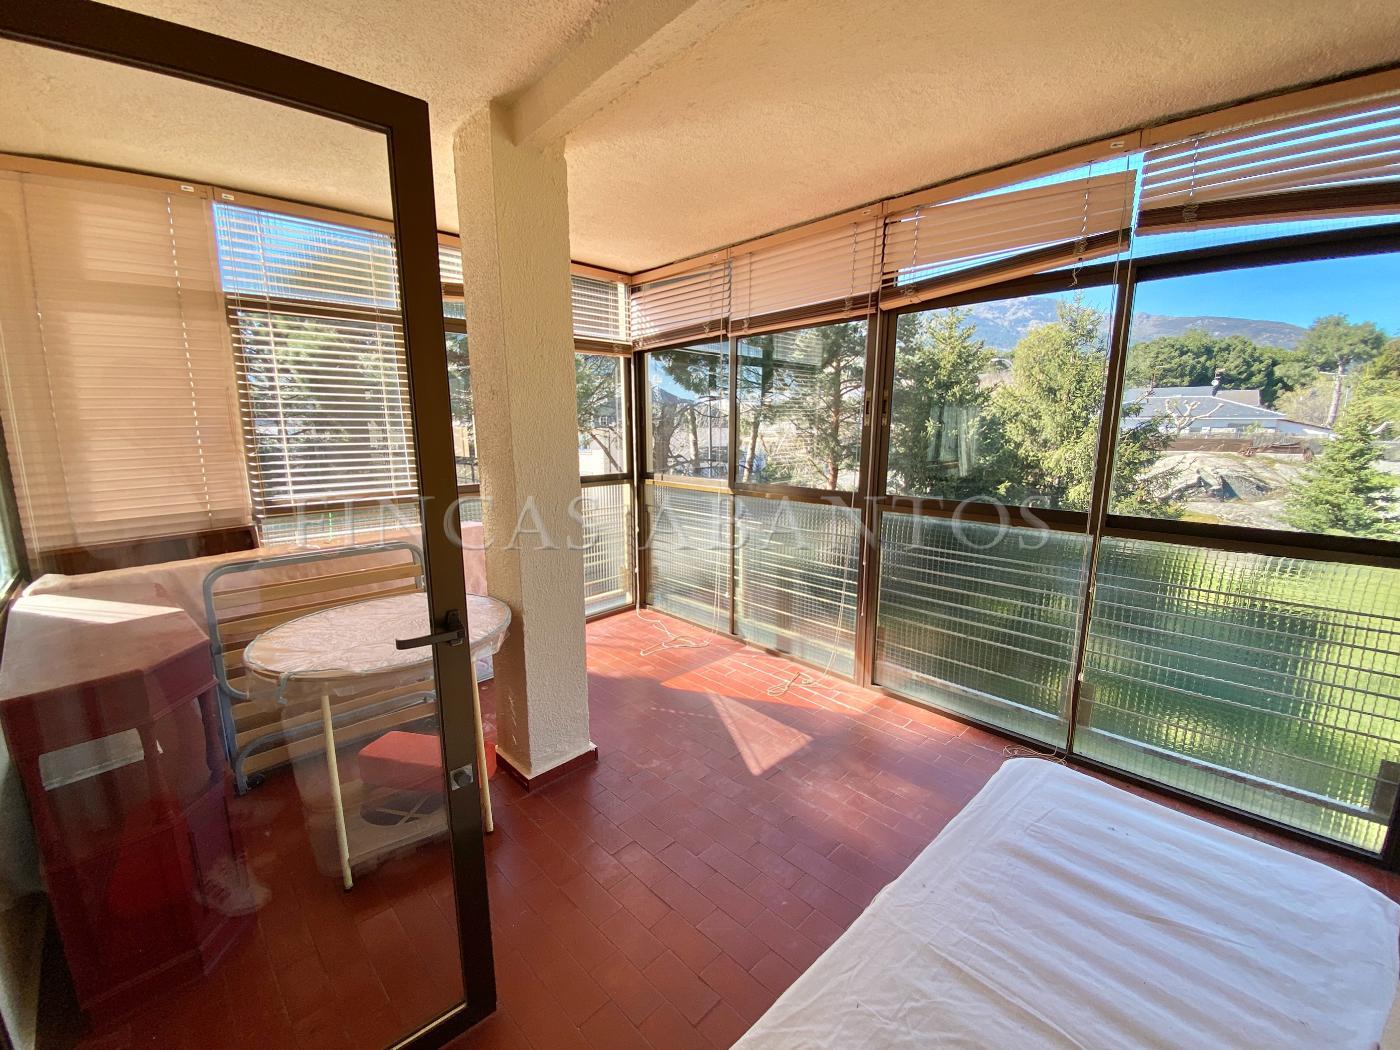 For sale of flat in El Escorial